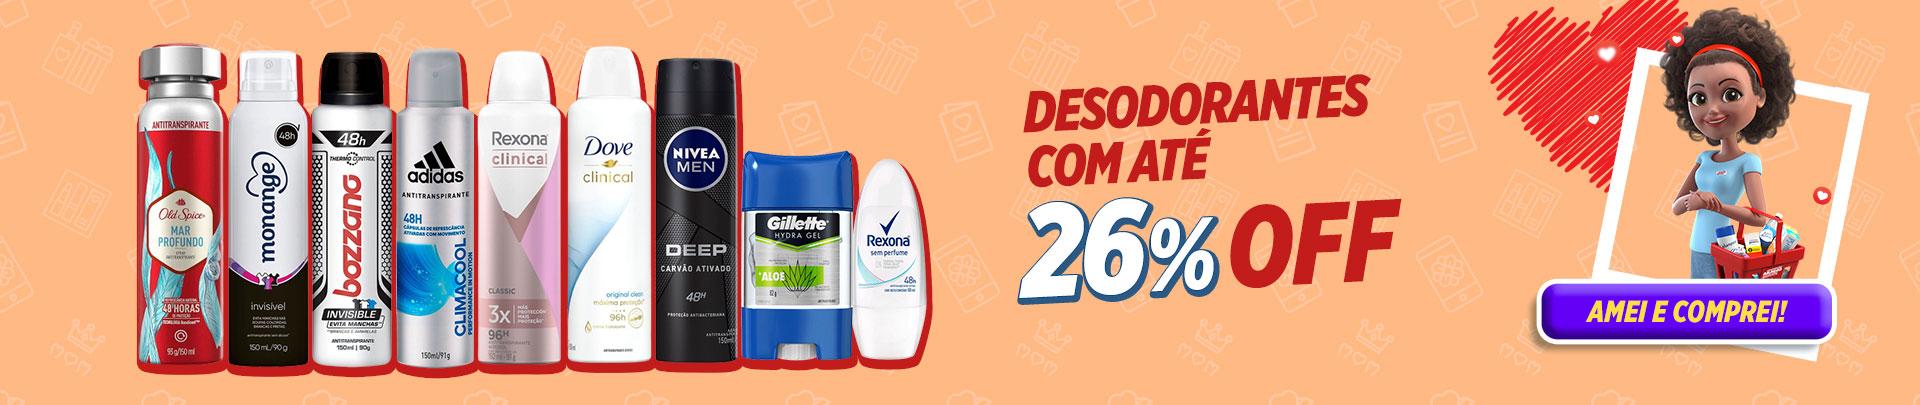 Desodorantes_Tab354